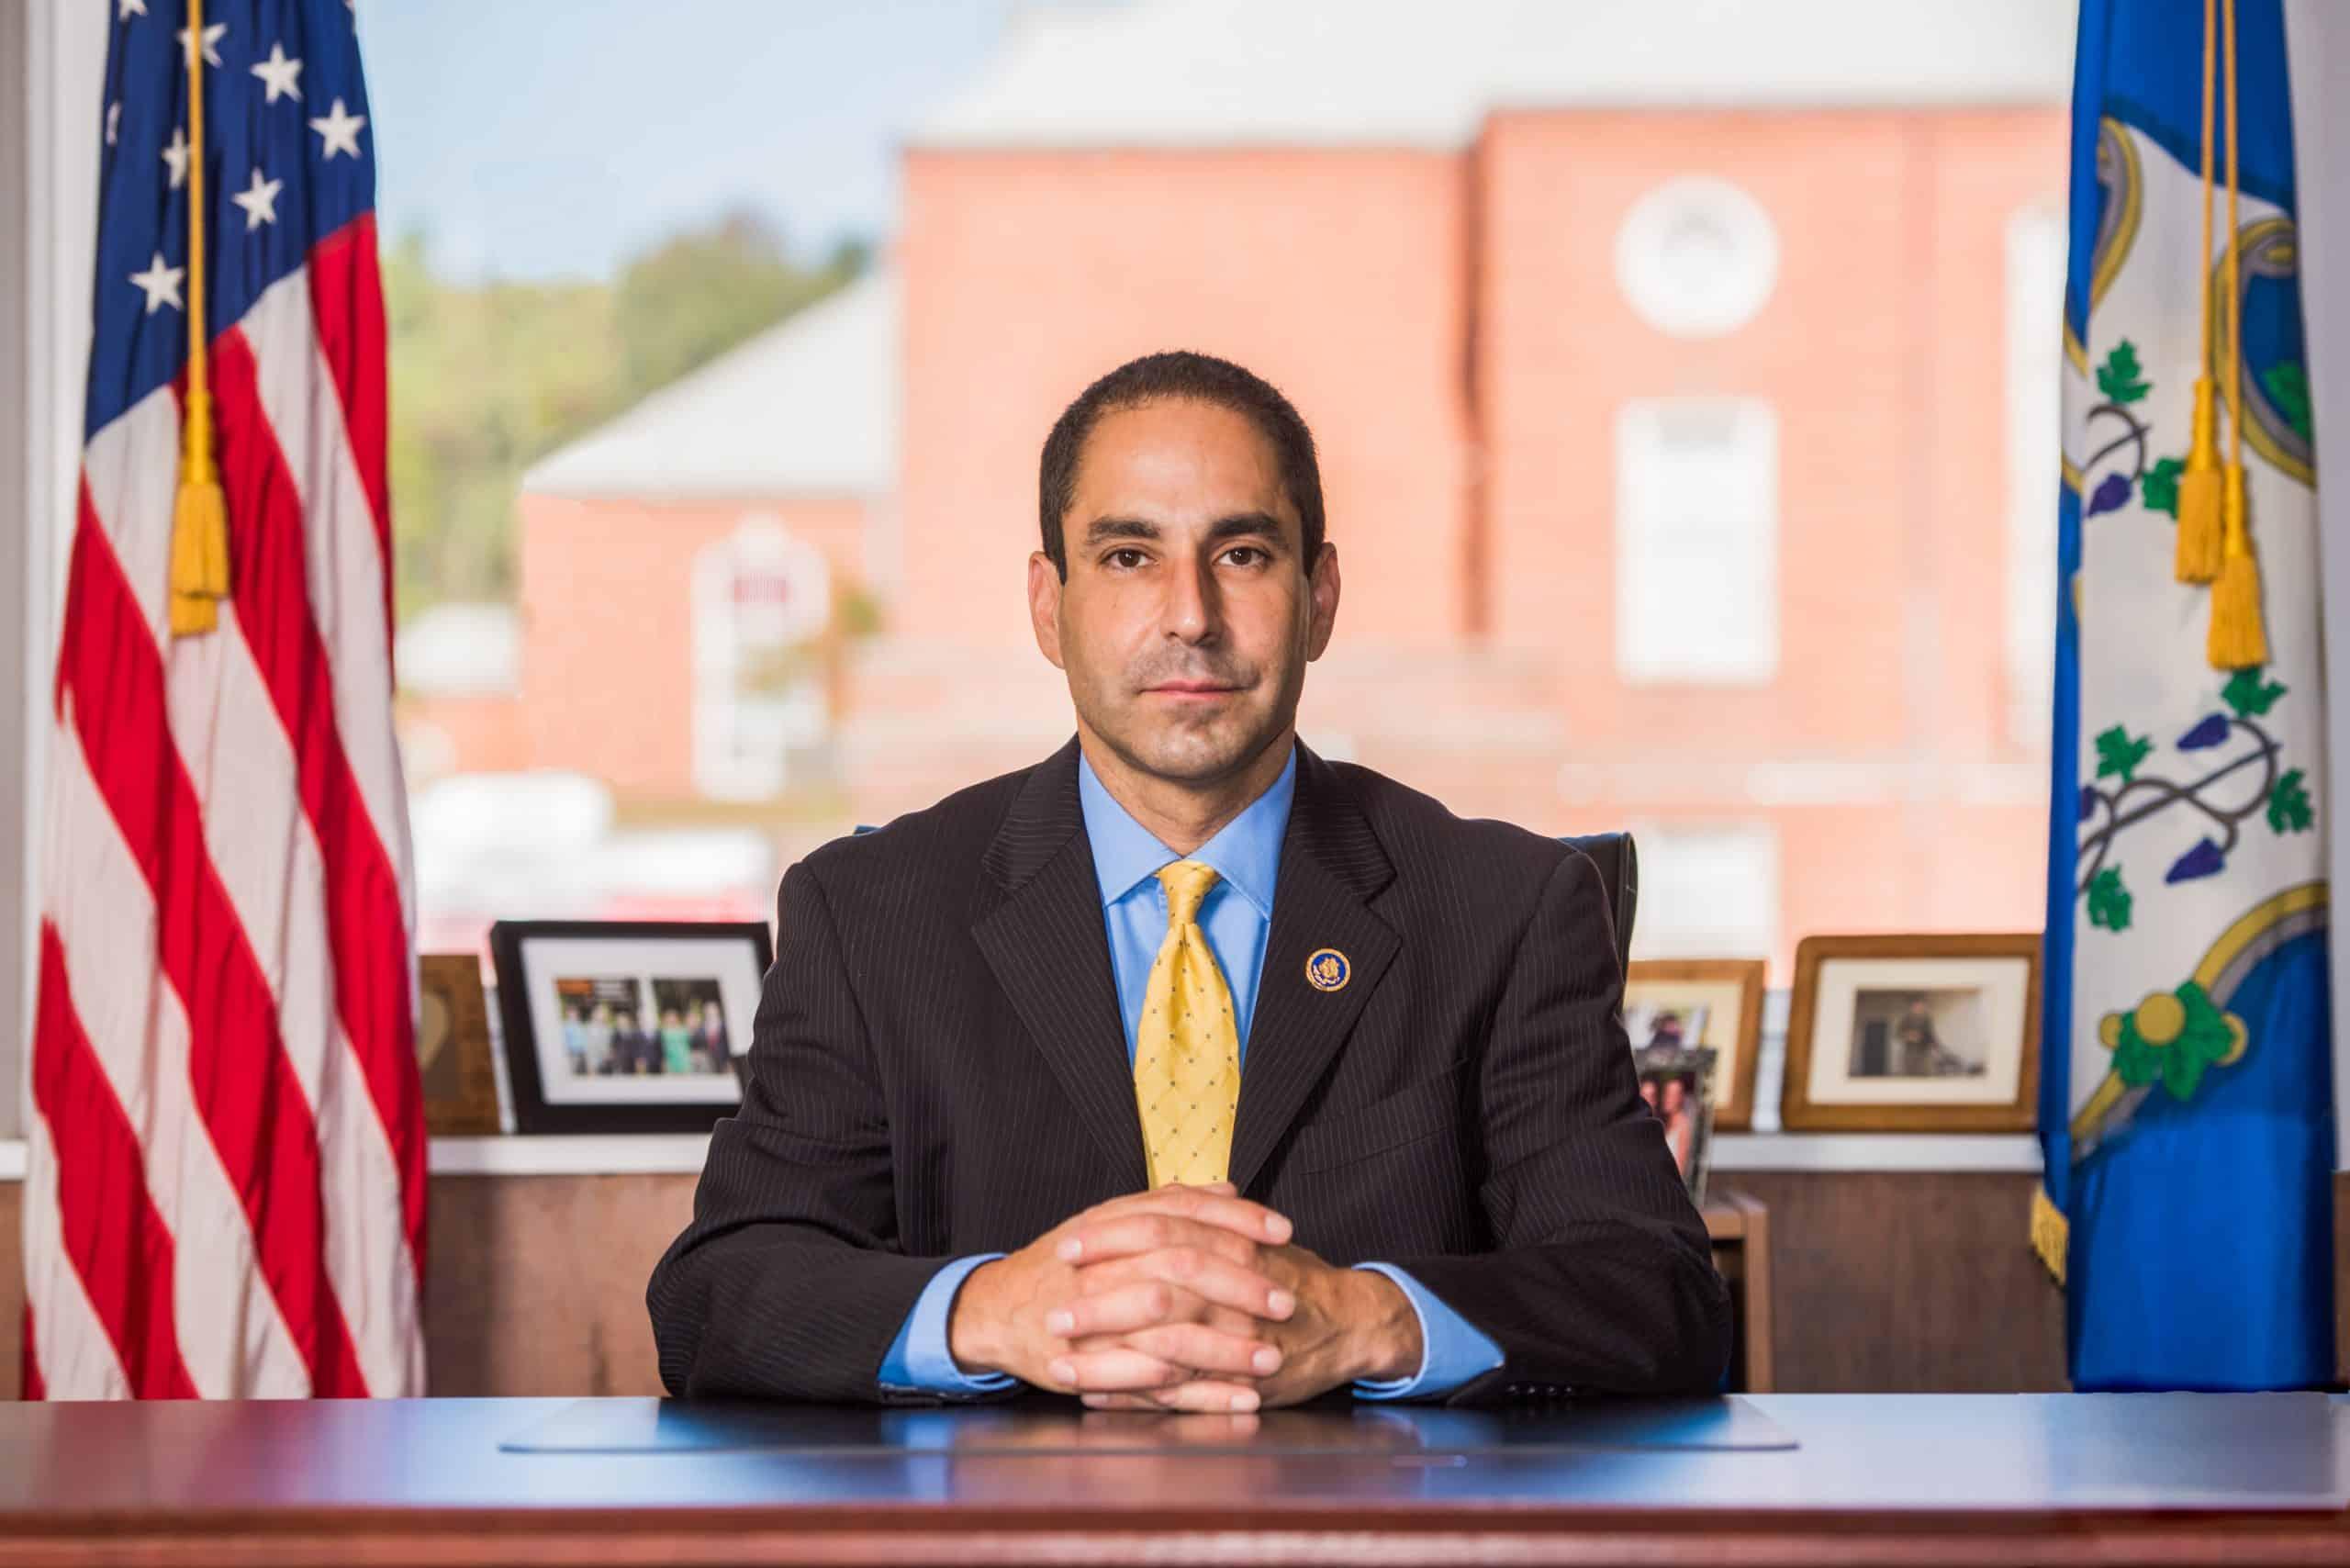 CTLN Opinion+: Commissioner Thomas Saadi, Department of Veteran Affairs